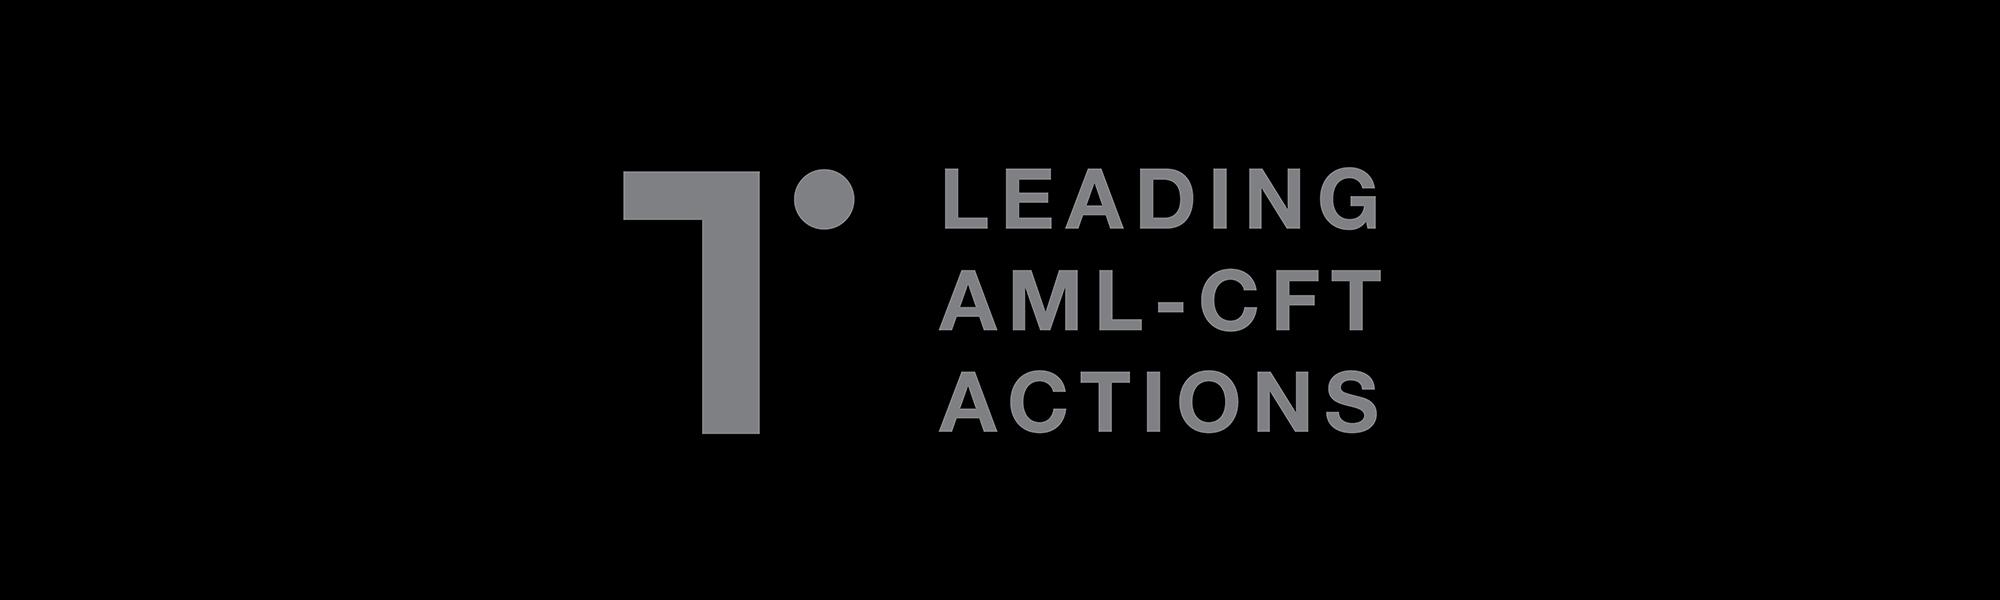 Marteau Abogados AML-CFT Actions